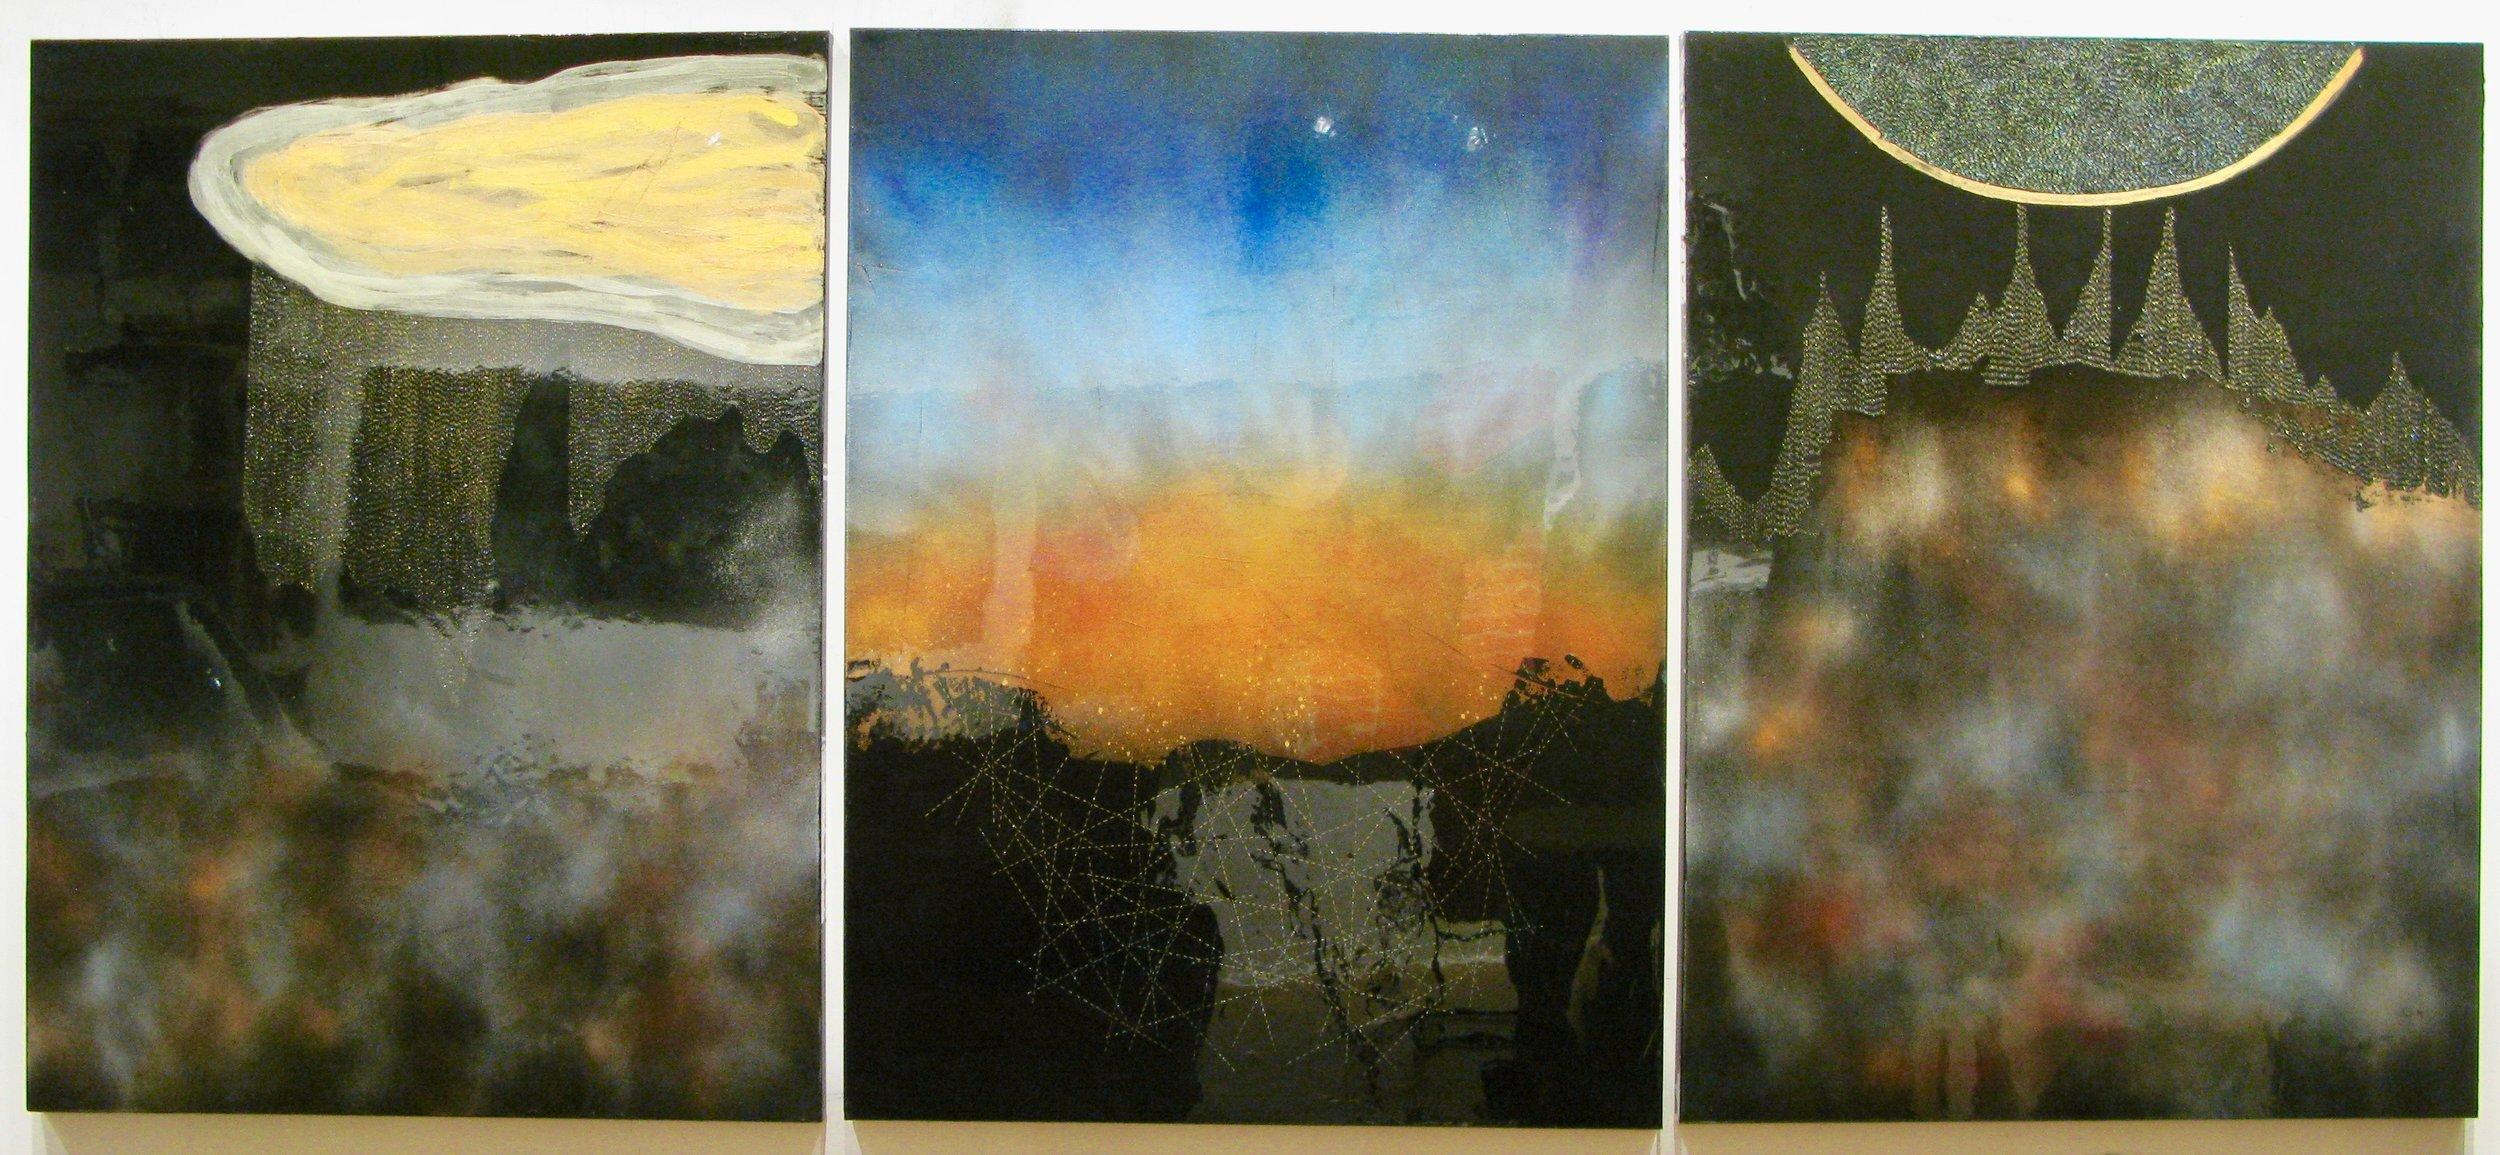 SARDONYX, 2016, mixed mediums on canvas, Triptycvh: Total Dim: 48%22 x 108%22 (121.9 x 274.2  cm).jpg